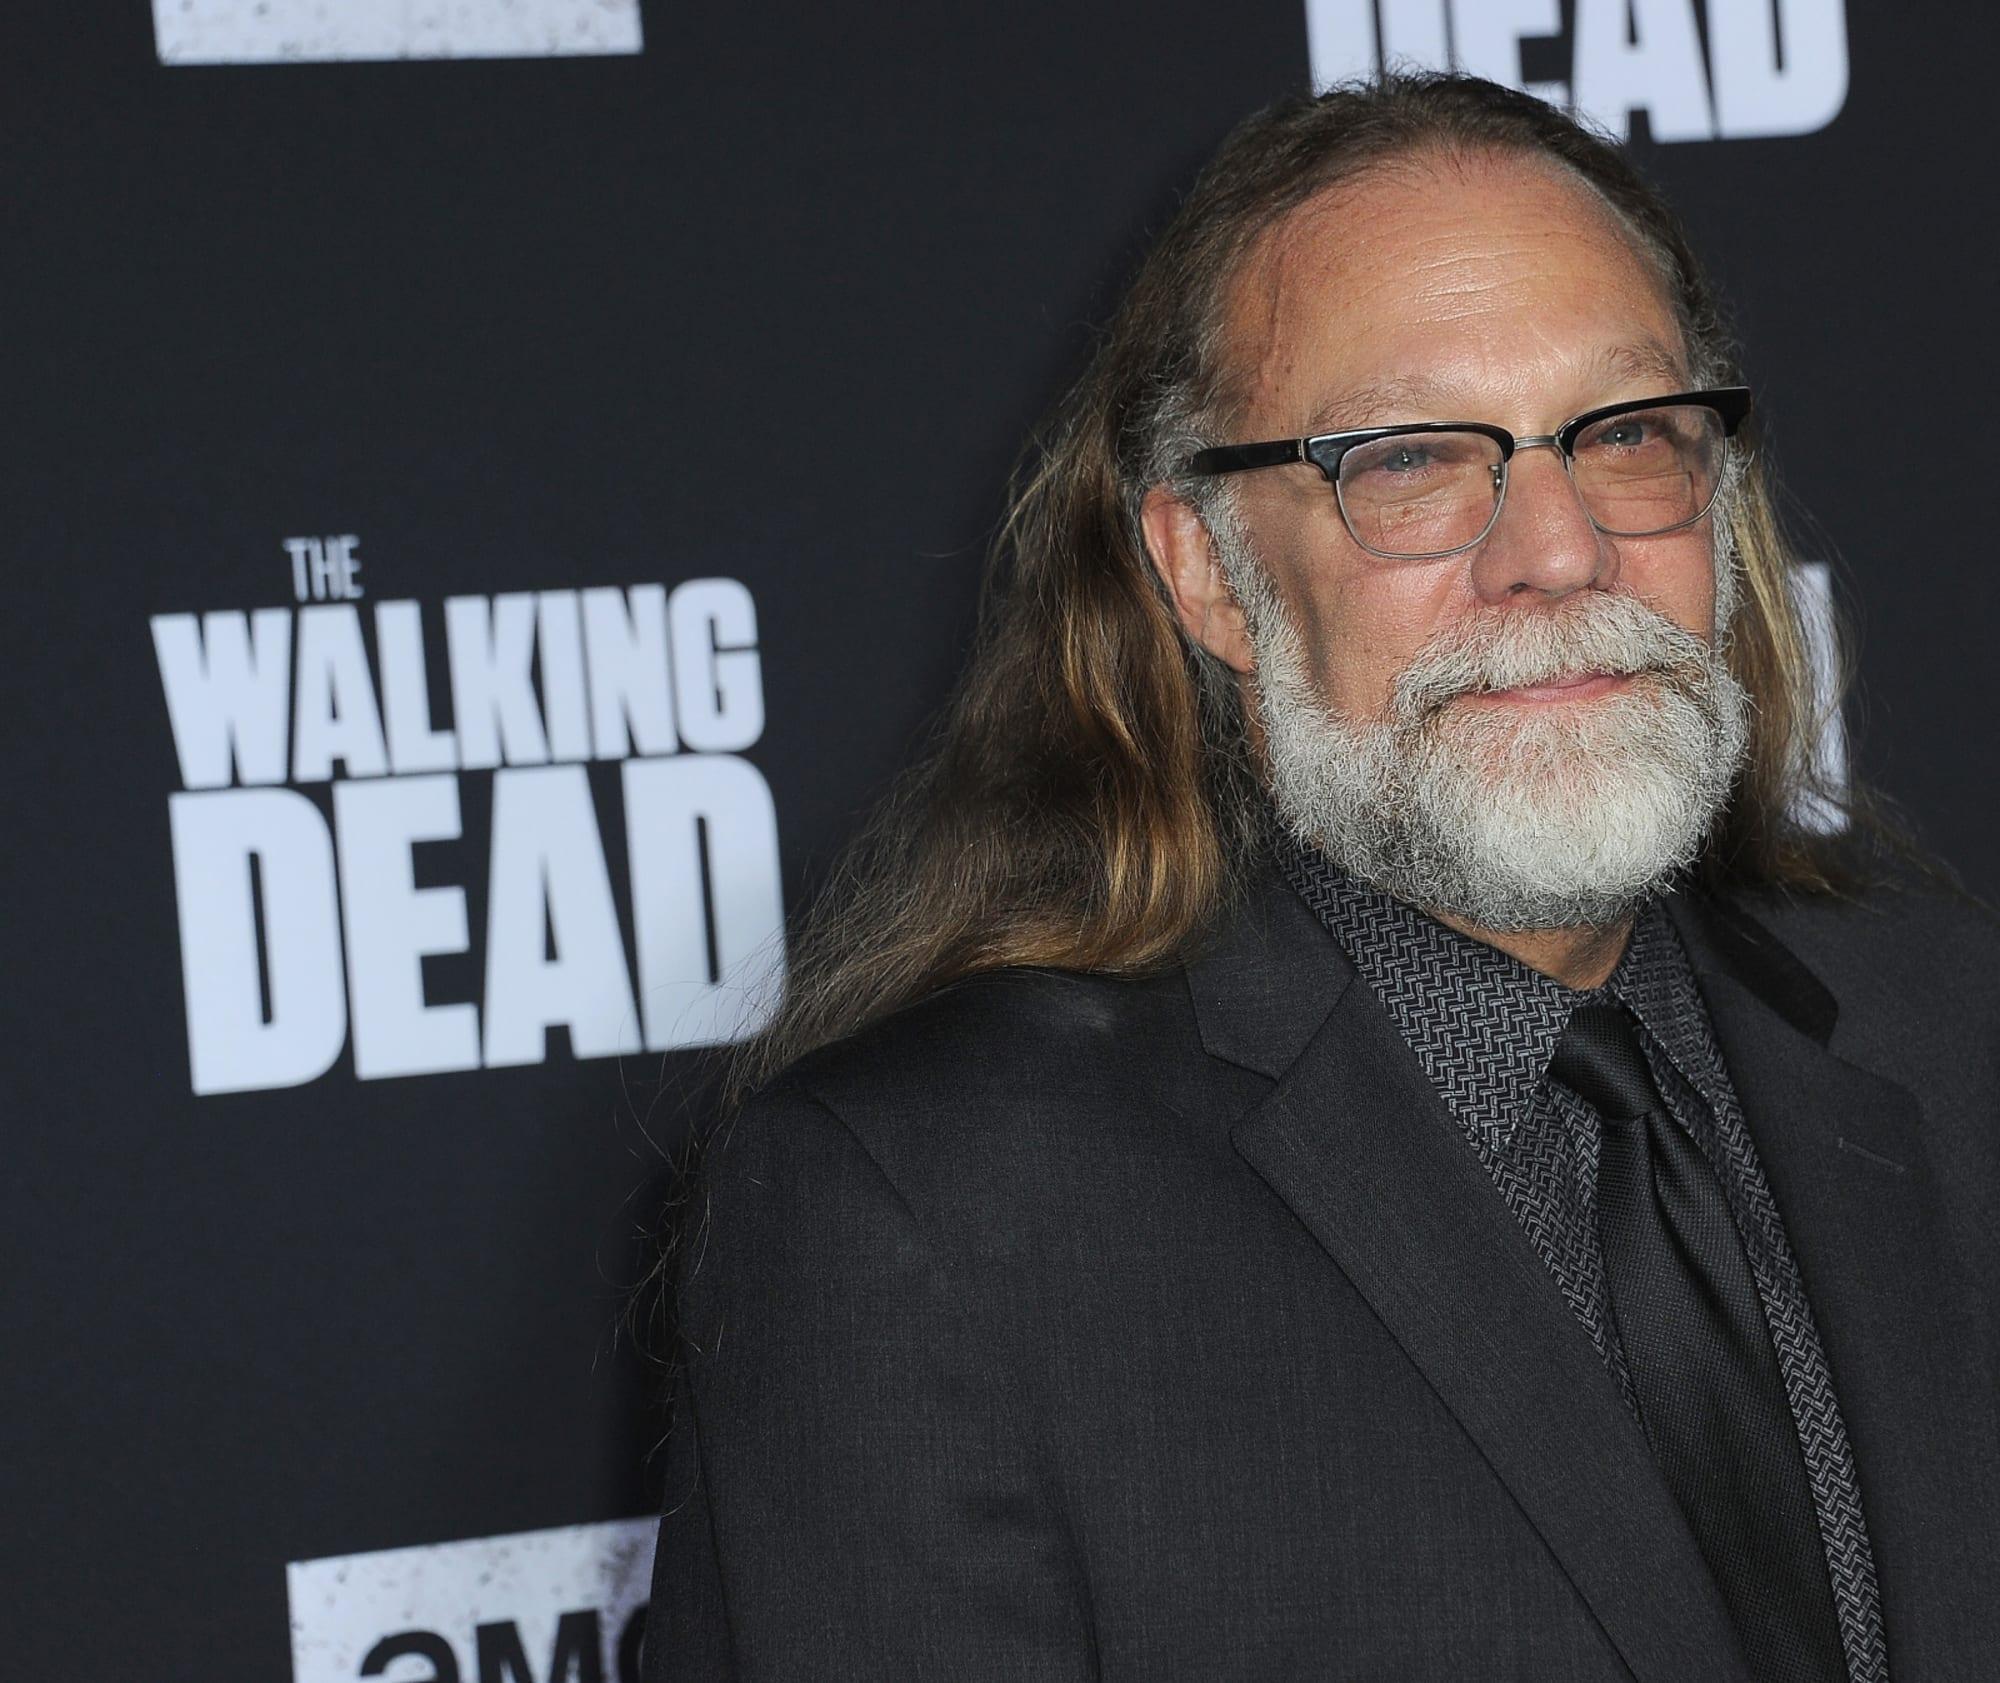 Greg Nicotero filmed two seasons of Creepshow during a pandemic